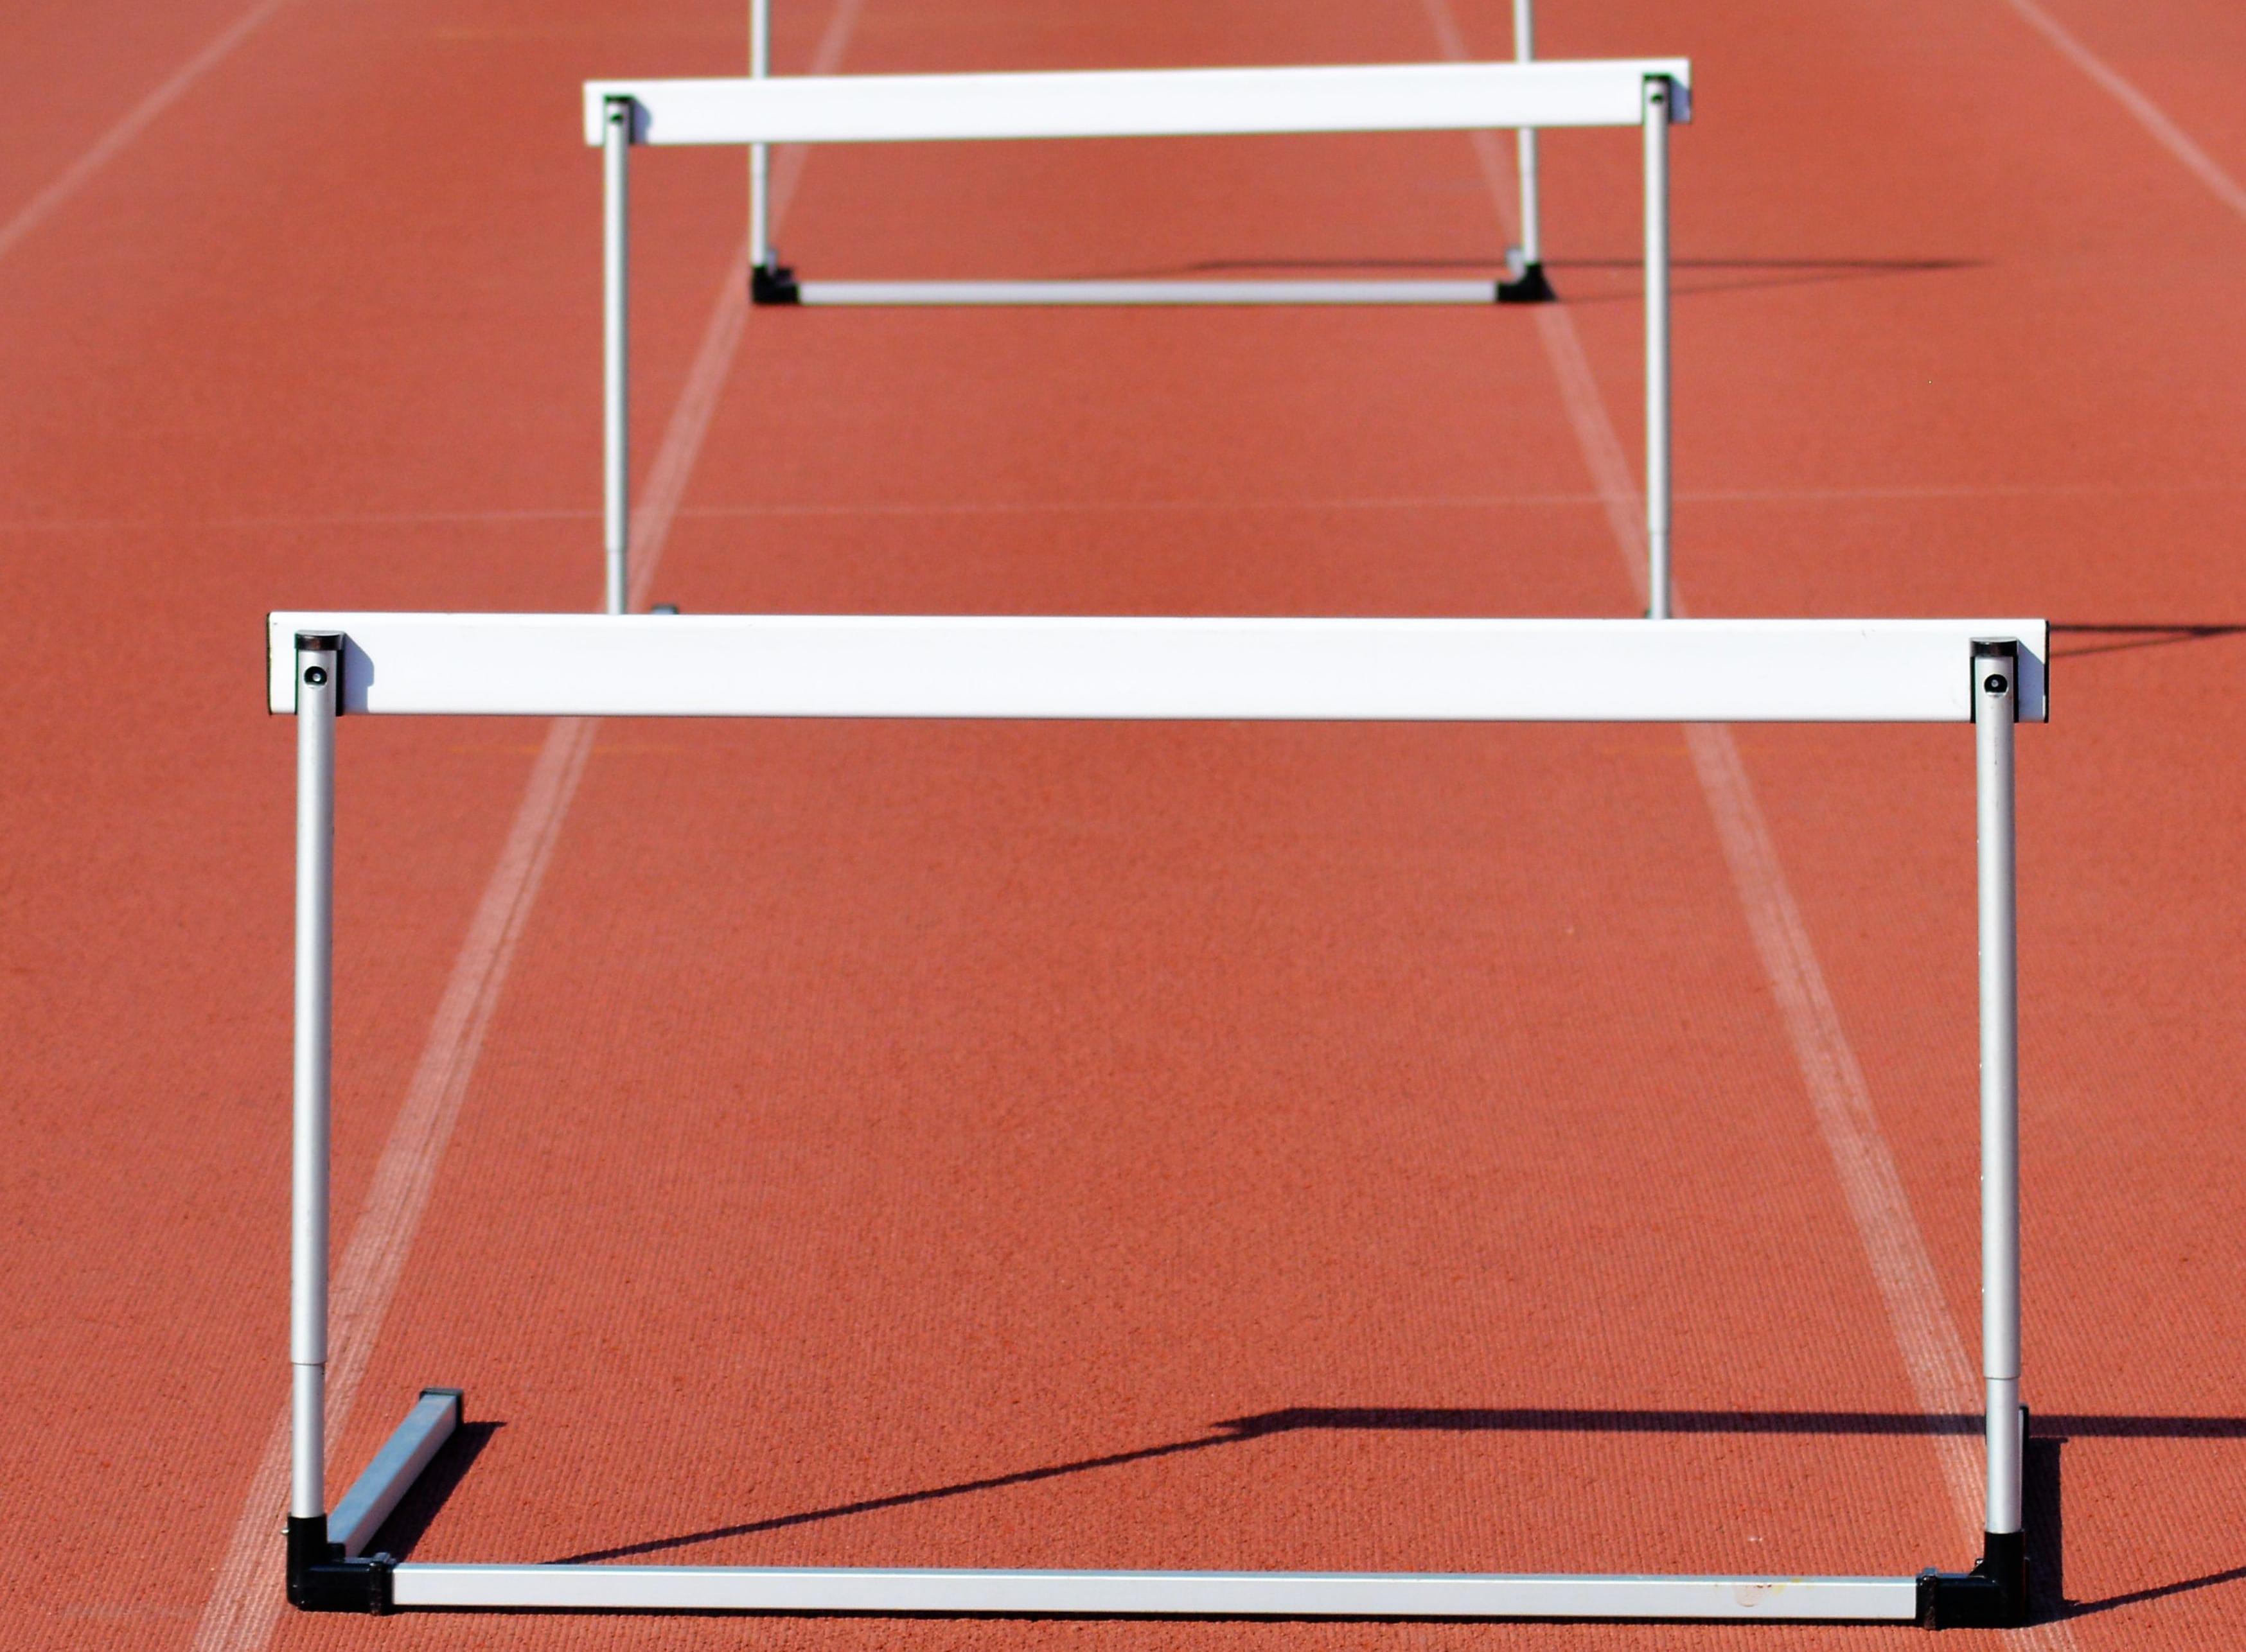 interactive-sports-VYTQNnaboUA-unsplash